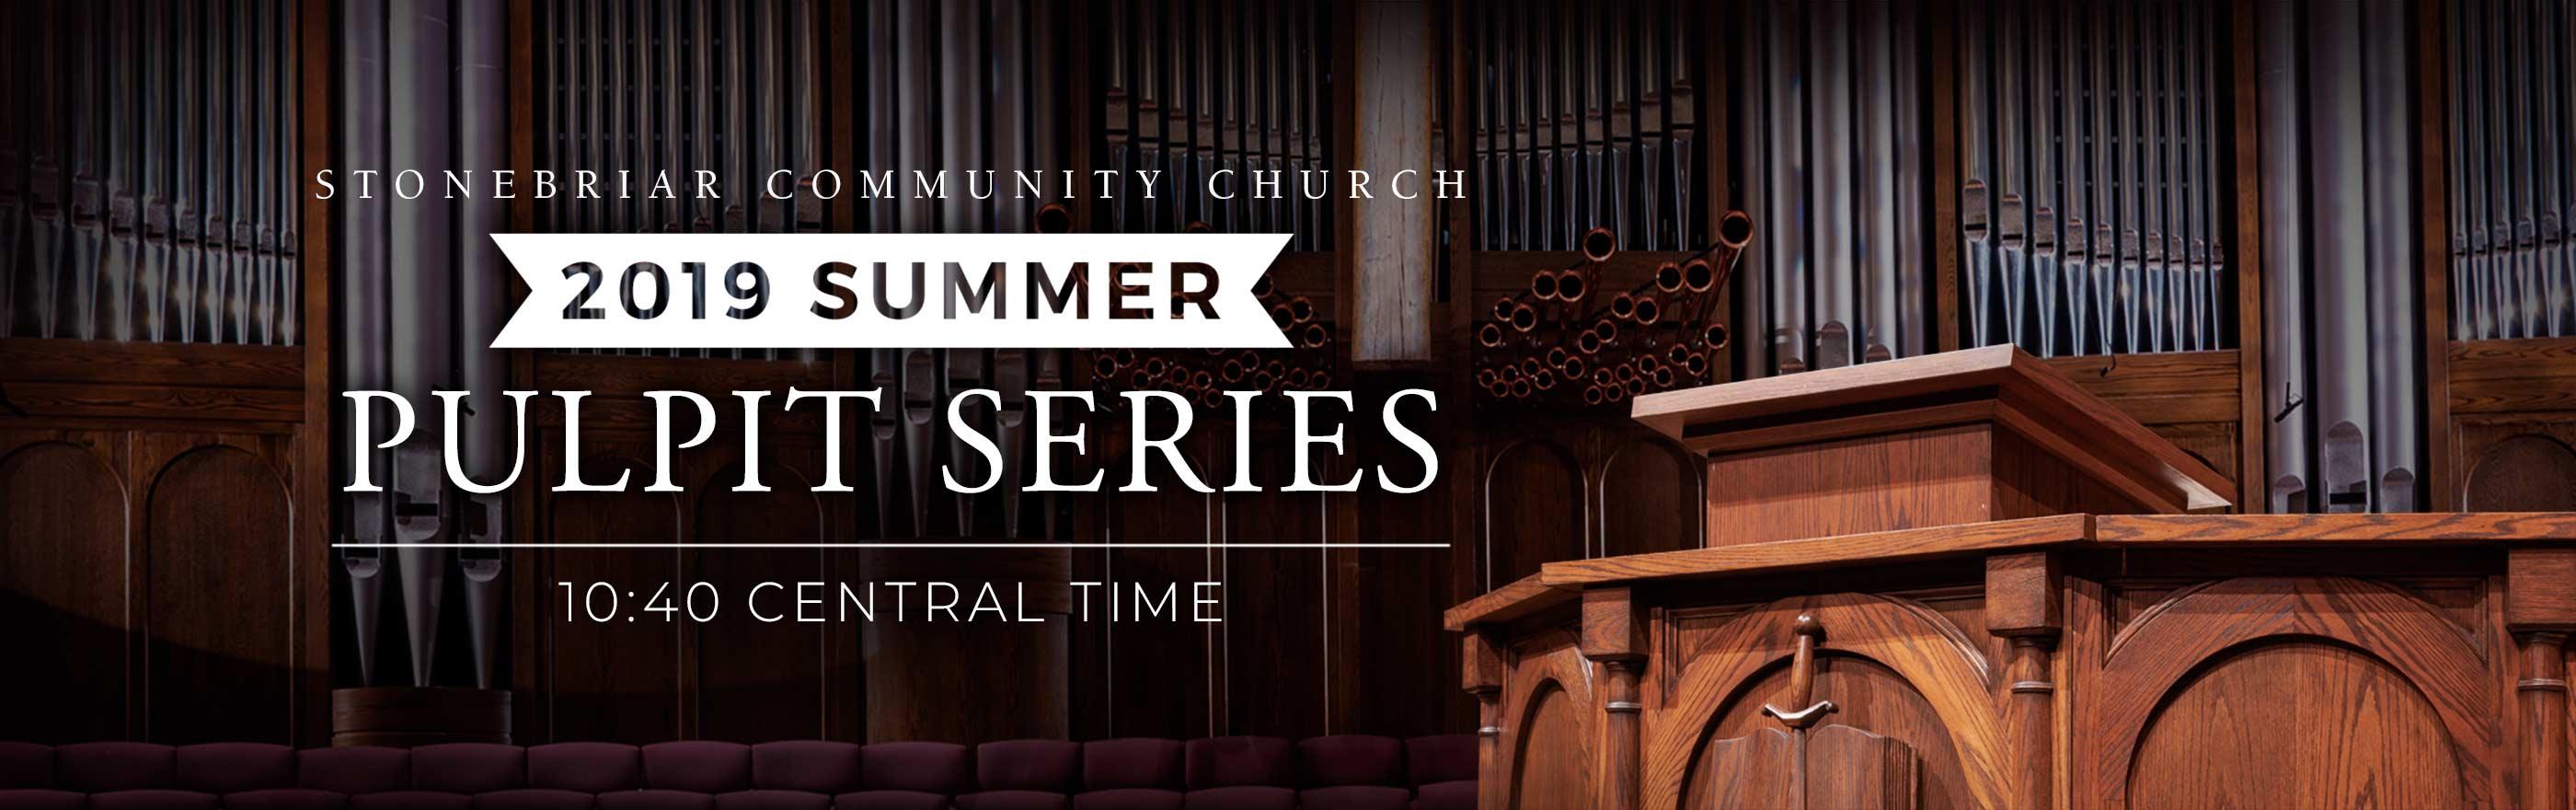 Insight for Living - Chuck Swindoll's Bible-teaching via articles